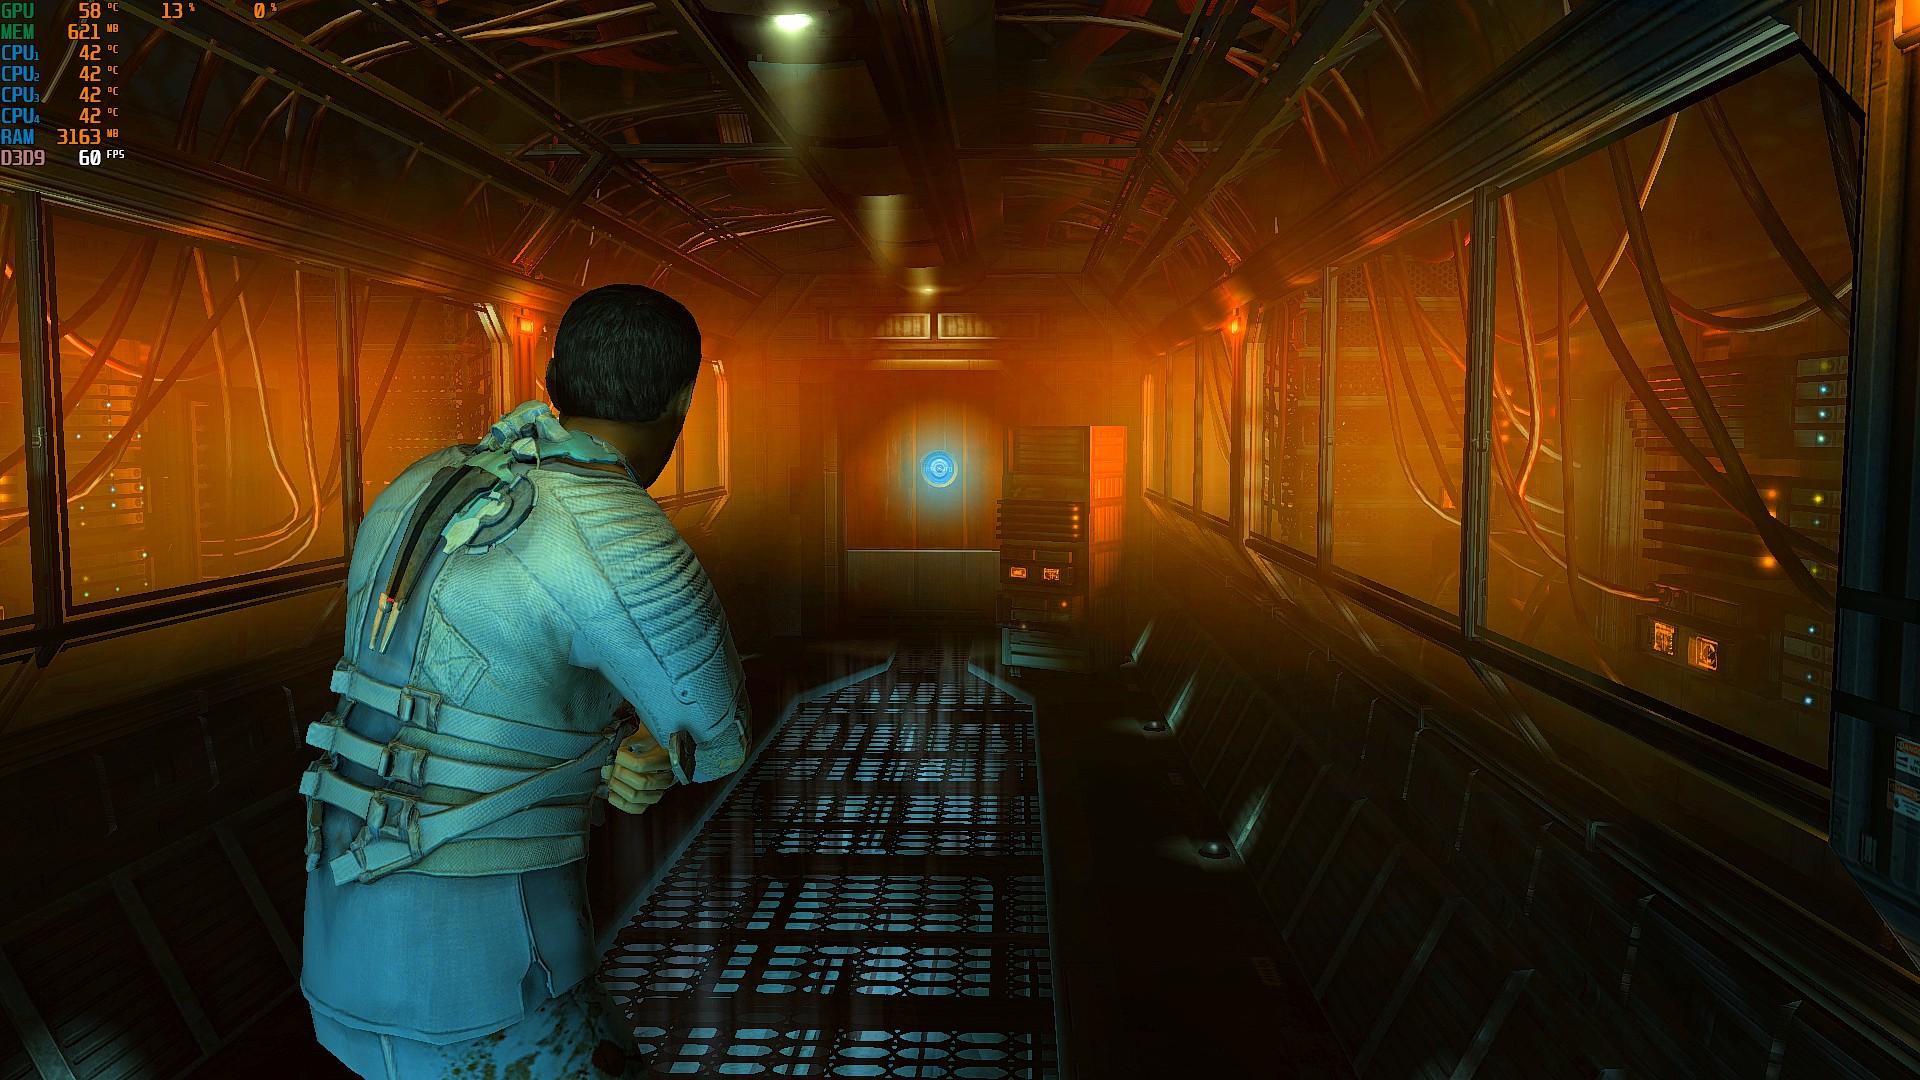 00018.Jpg - Dead Space 2